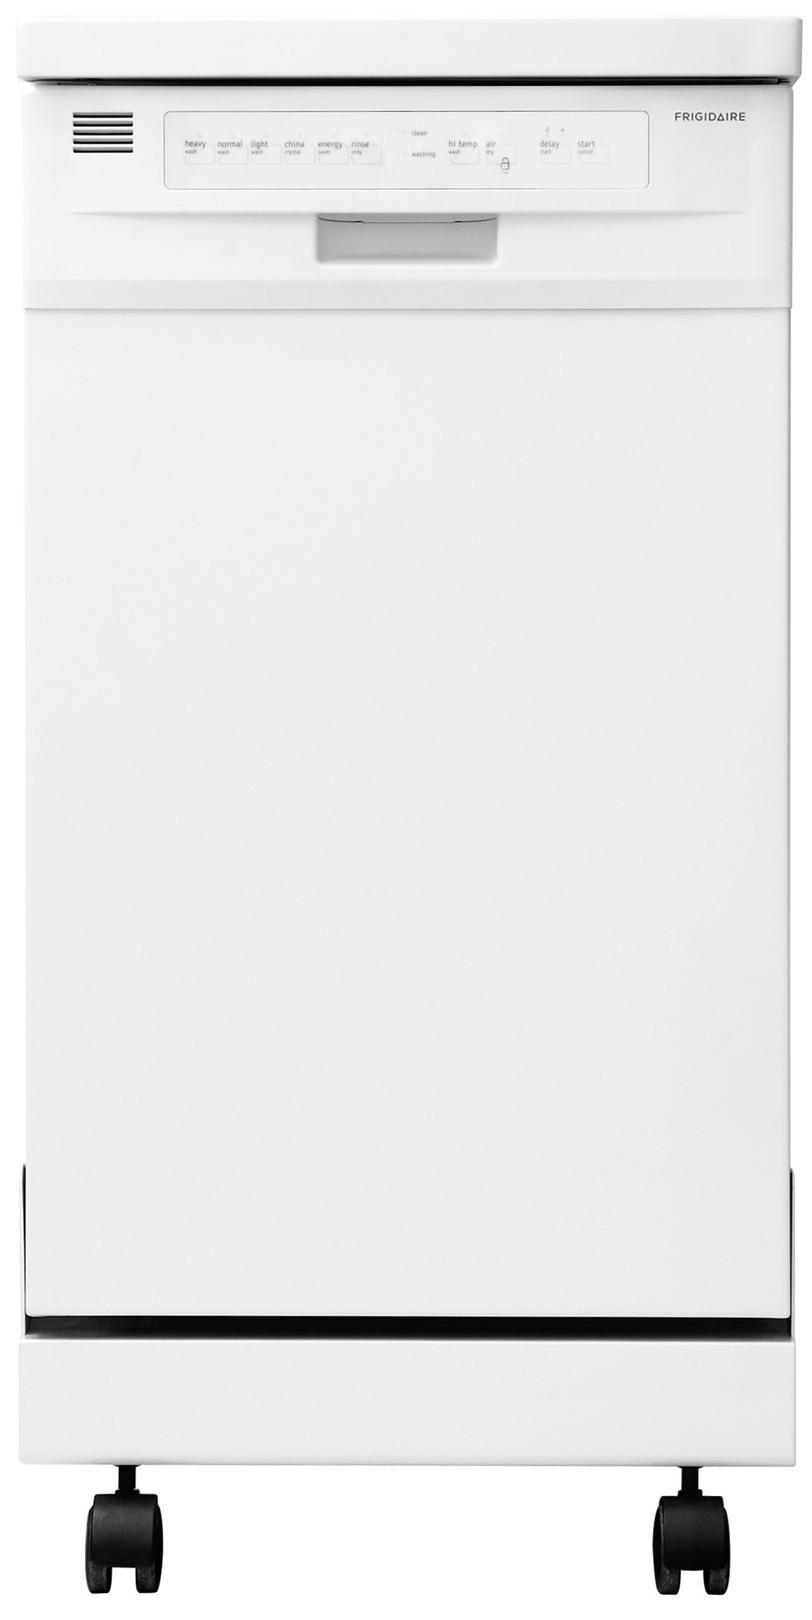 "Frigidaire Dishwashers 18"" Portable Dishwasher - Item Number: FFPD1821MW"